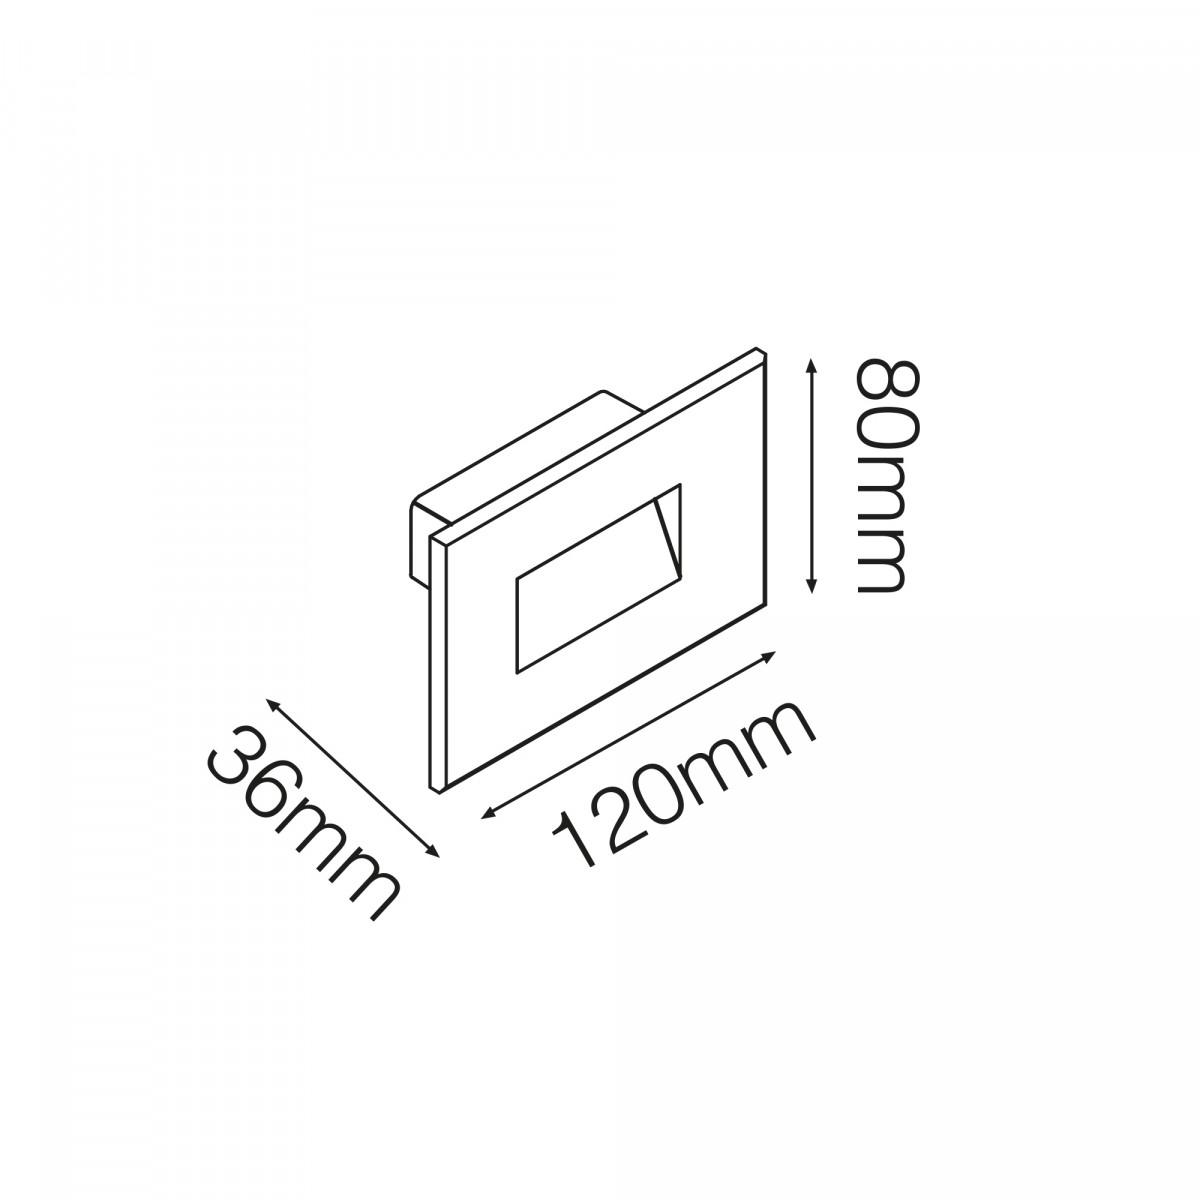 Inbouwspot Silicon 1